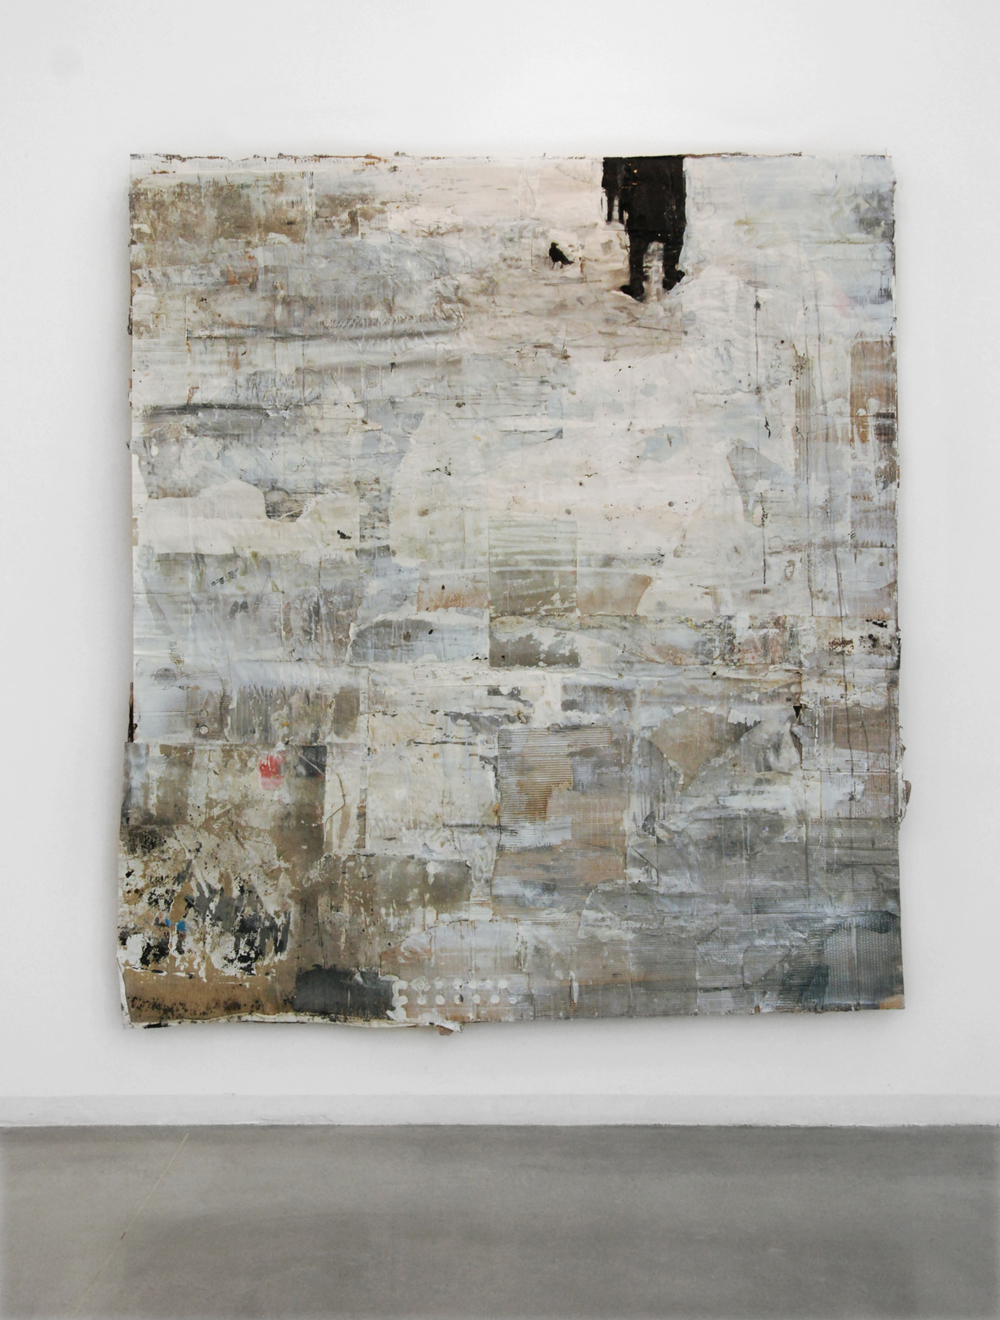 Aldo van den Broek_2014_Crowded 001_217 cm x 196cm.jpg